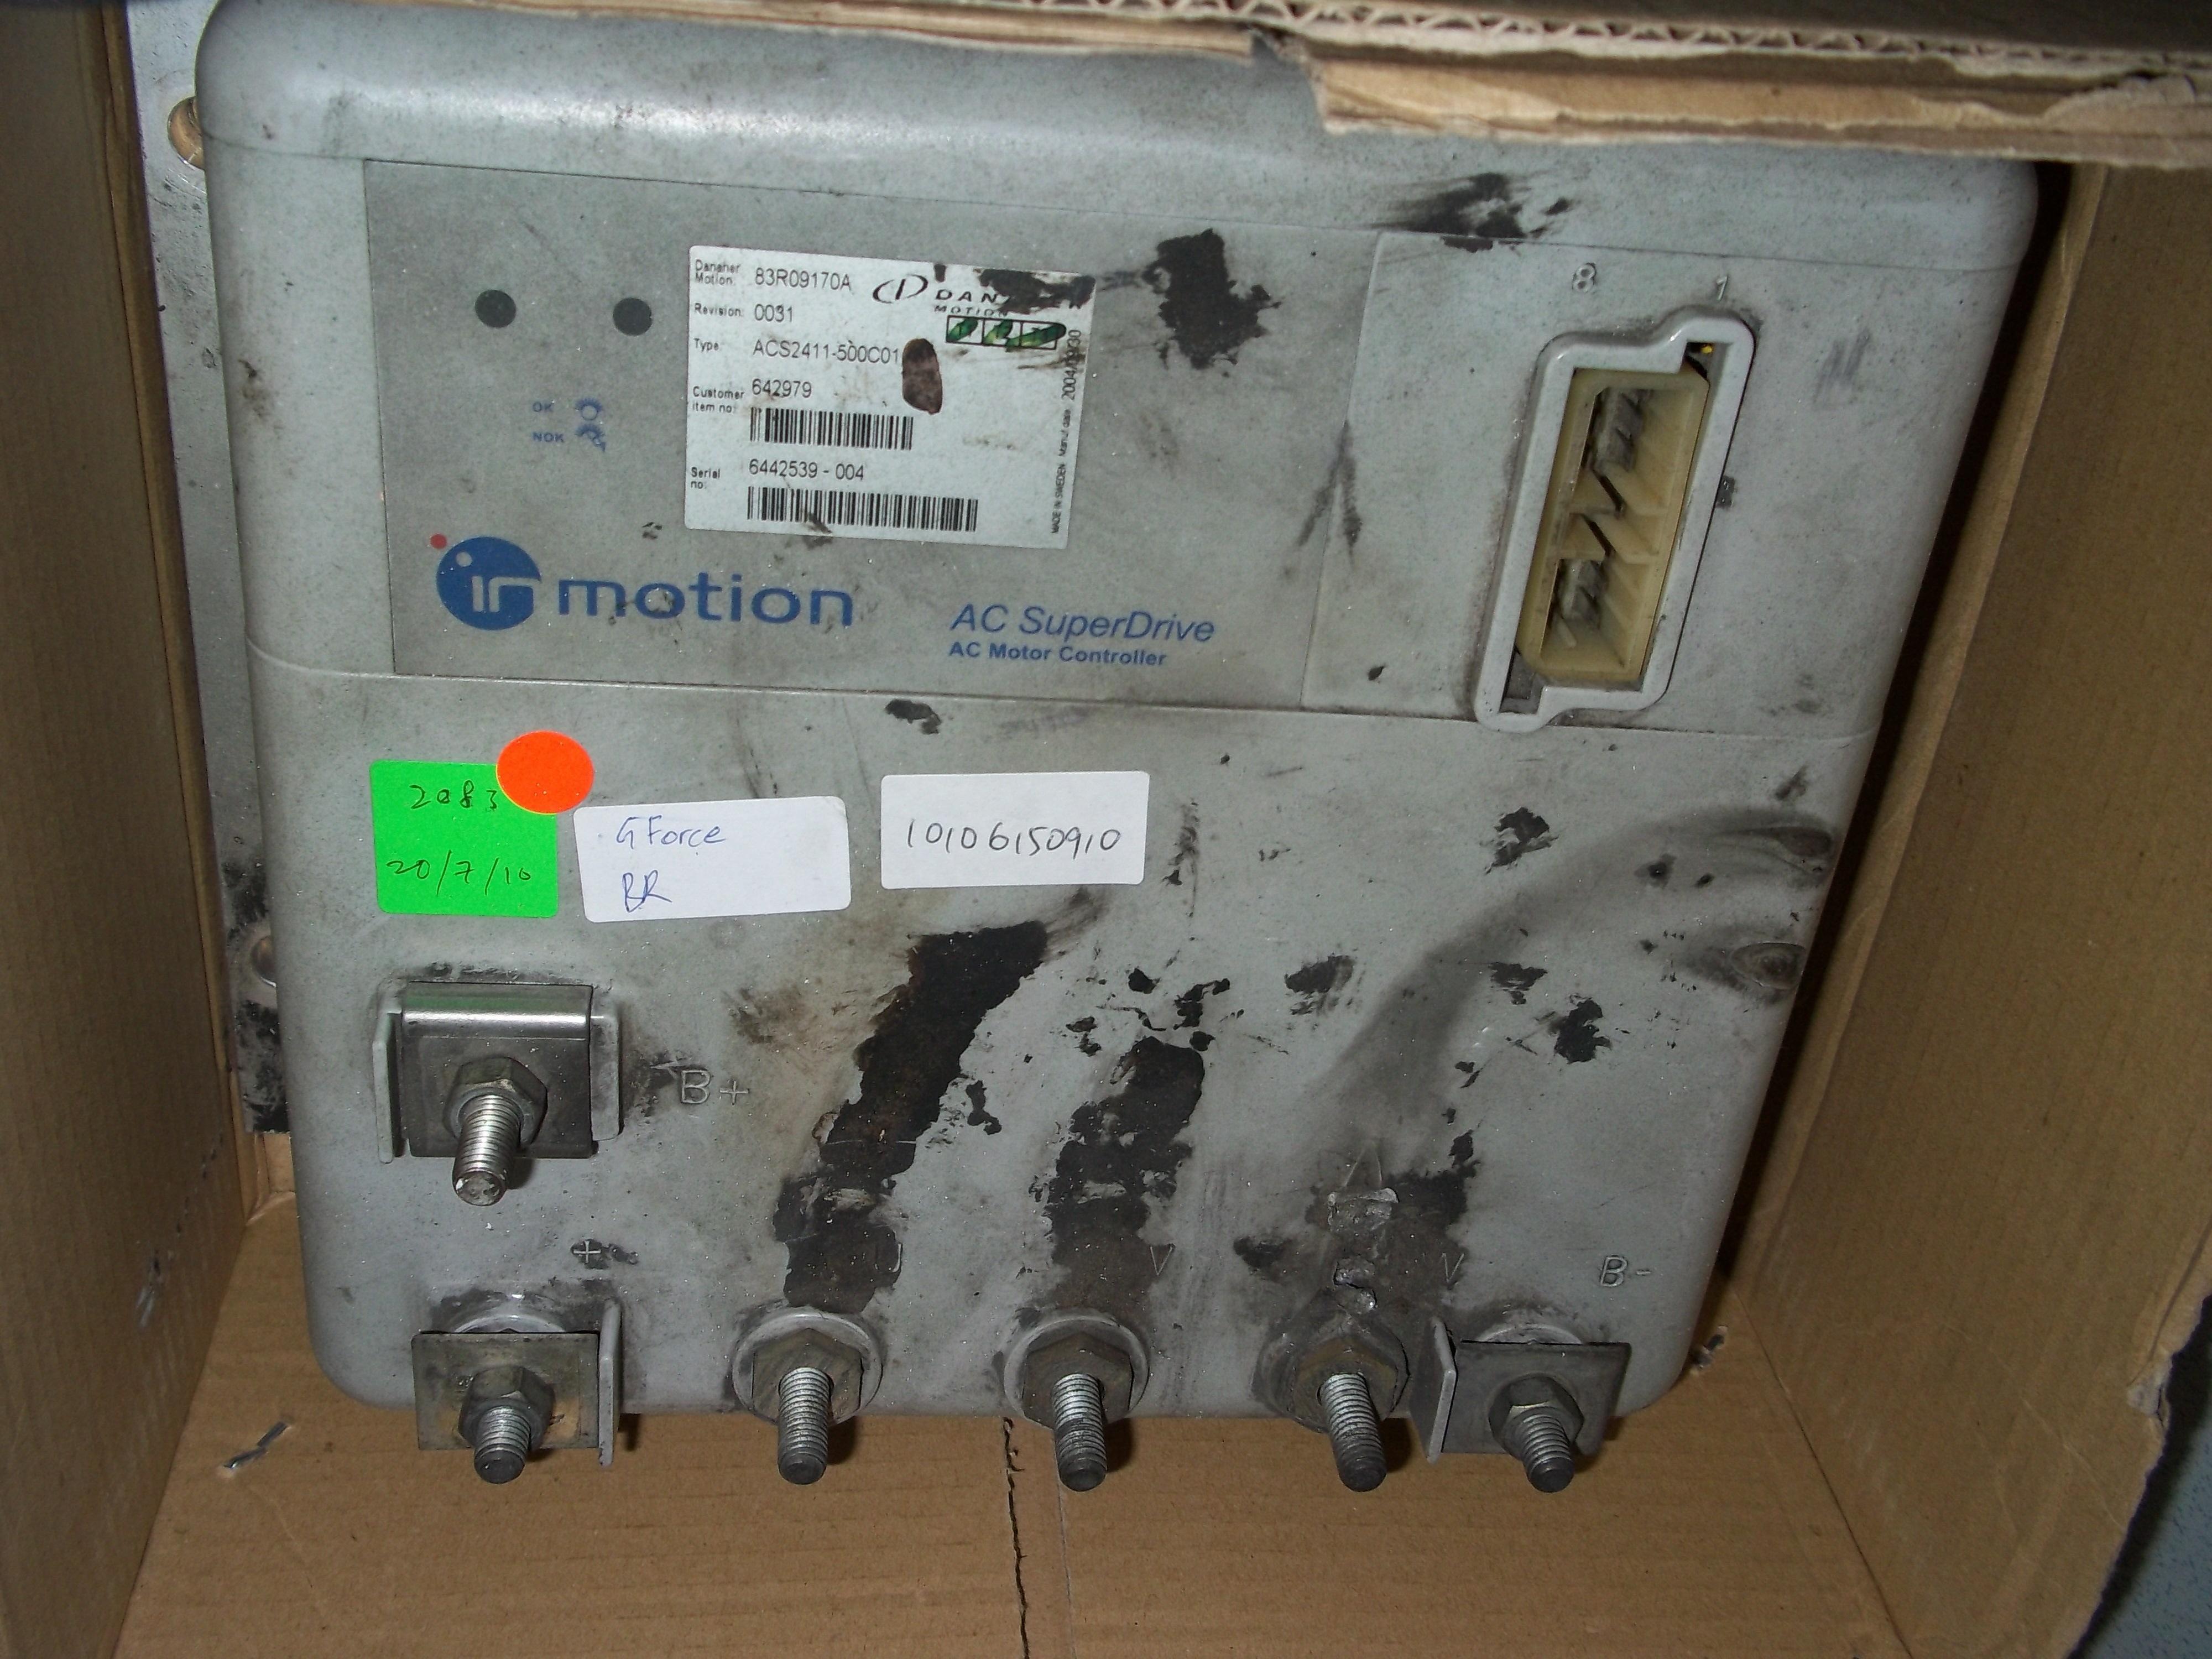 Repair ACS2411-500C01 DANAHER AC MOTOR CONTROLLER in Malaysia, Singapore, Thailand, Indonesia